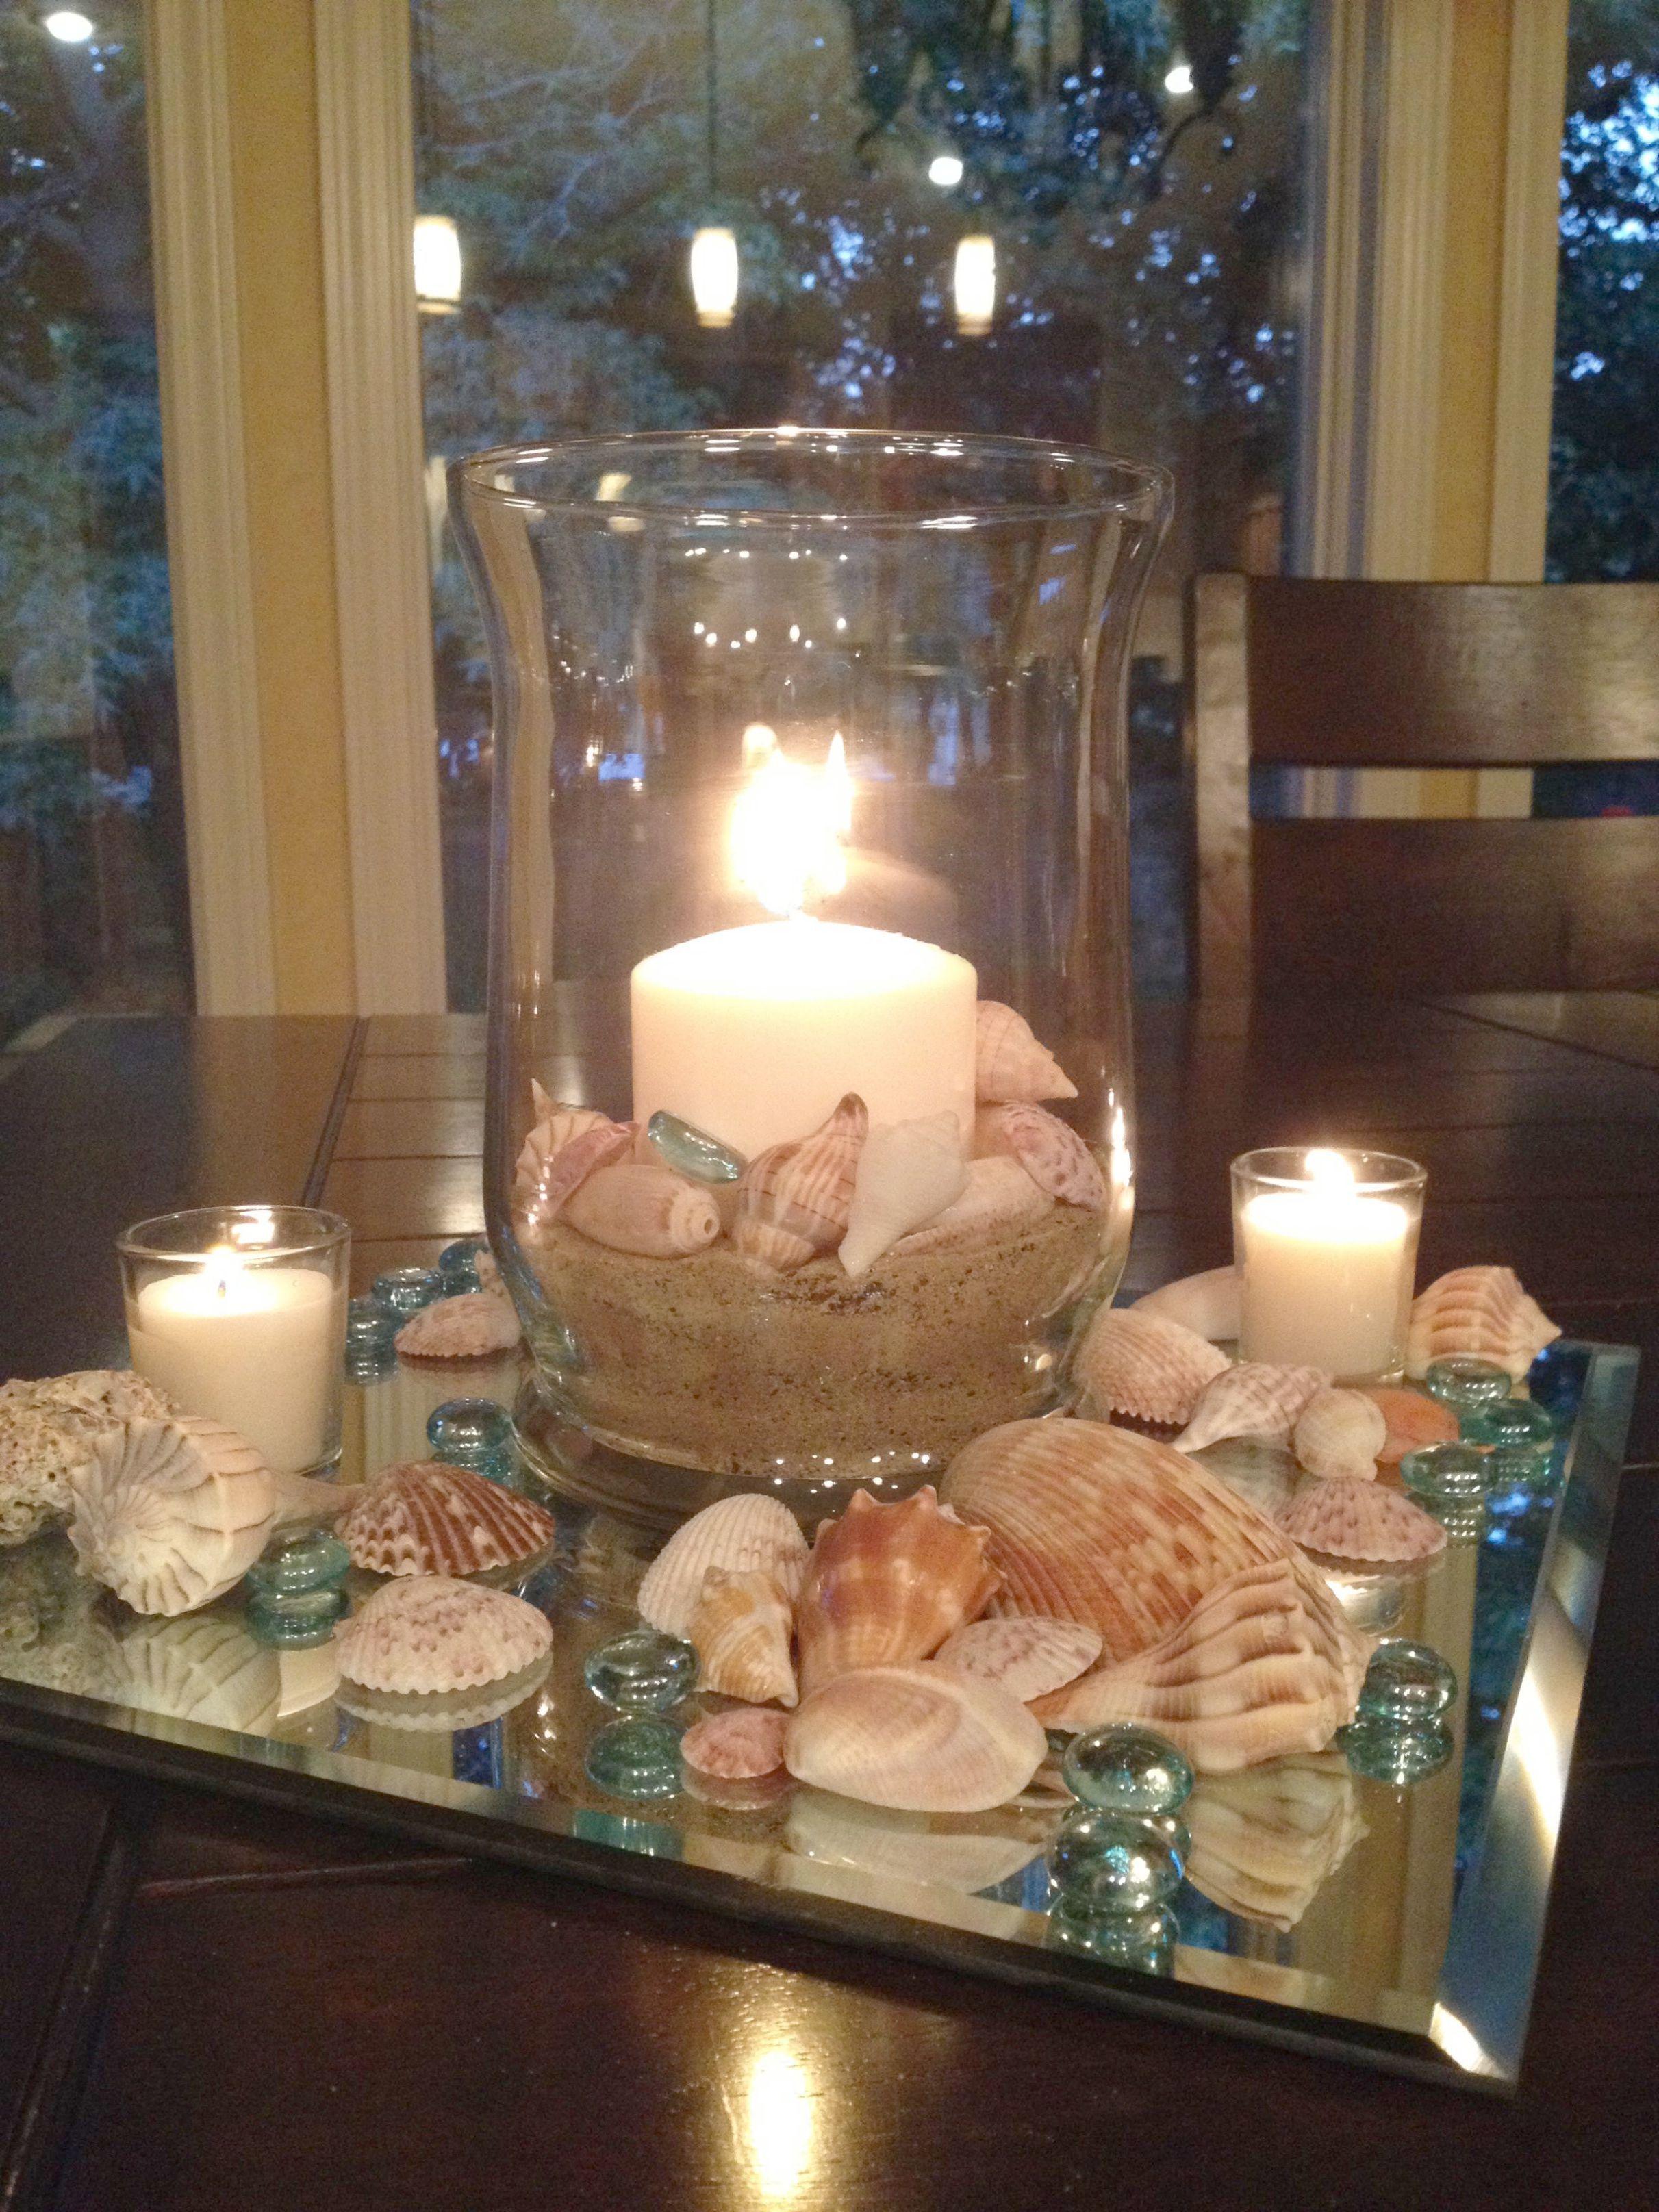 Tumbler Home Polished Sea Shells Sizes 2 25 To 4 Approx 20 Beach Shells In Mixed Colors 1 75 Lb Nautical Beach Decor Beach Wedding Centerpieces Beach Centerpieces Wedding Centerpieces